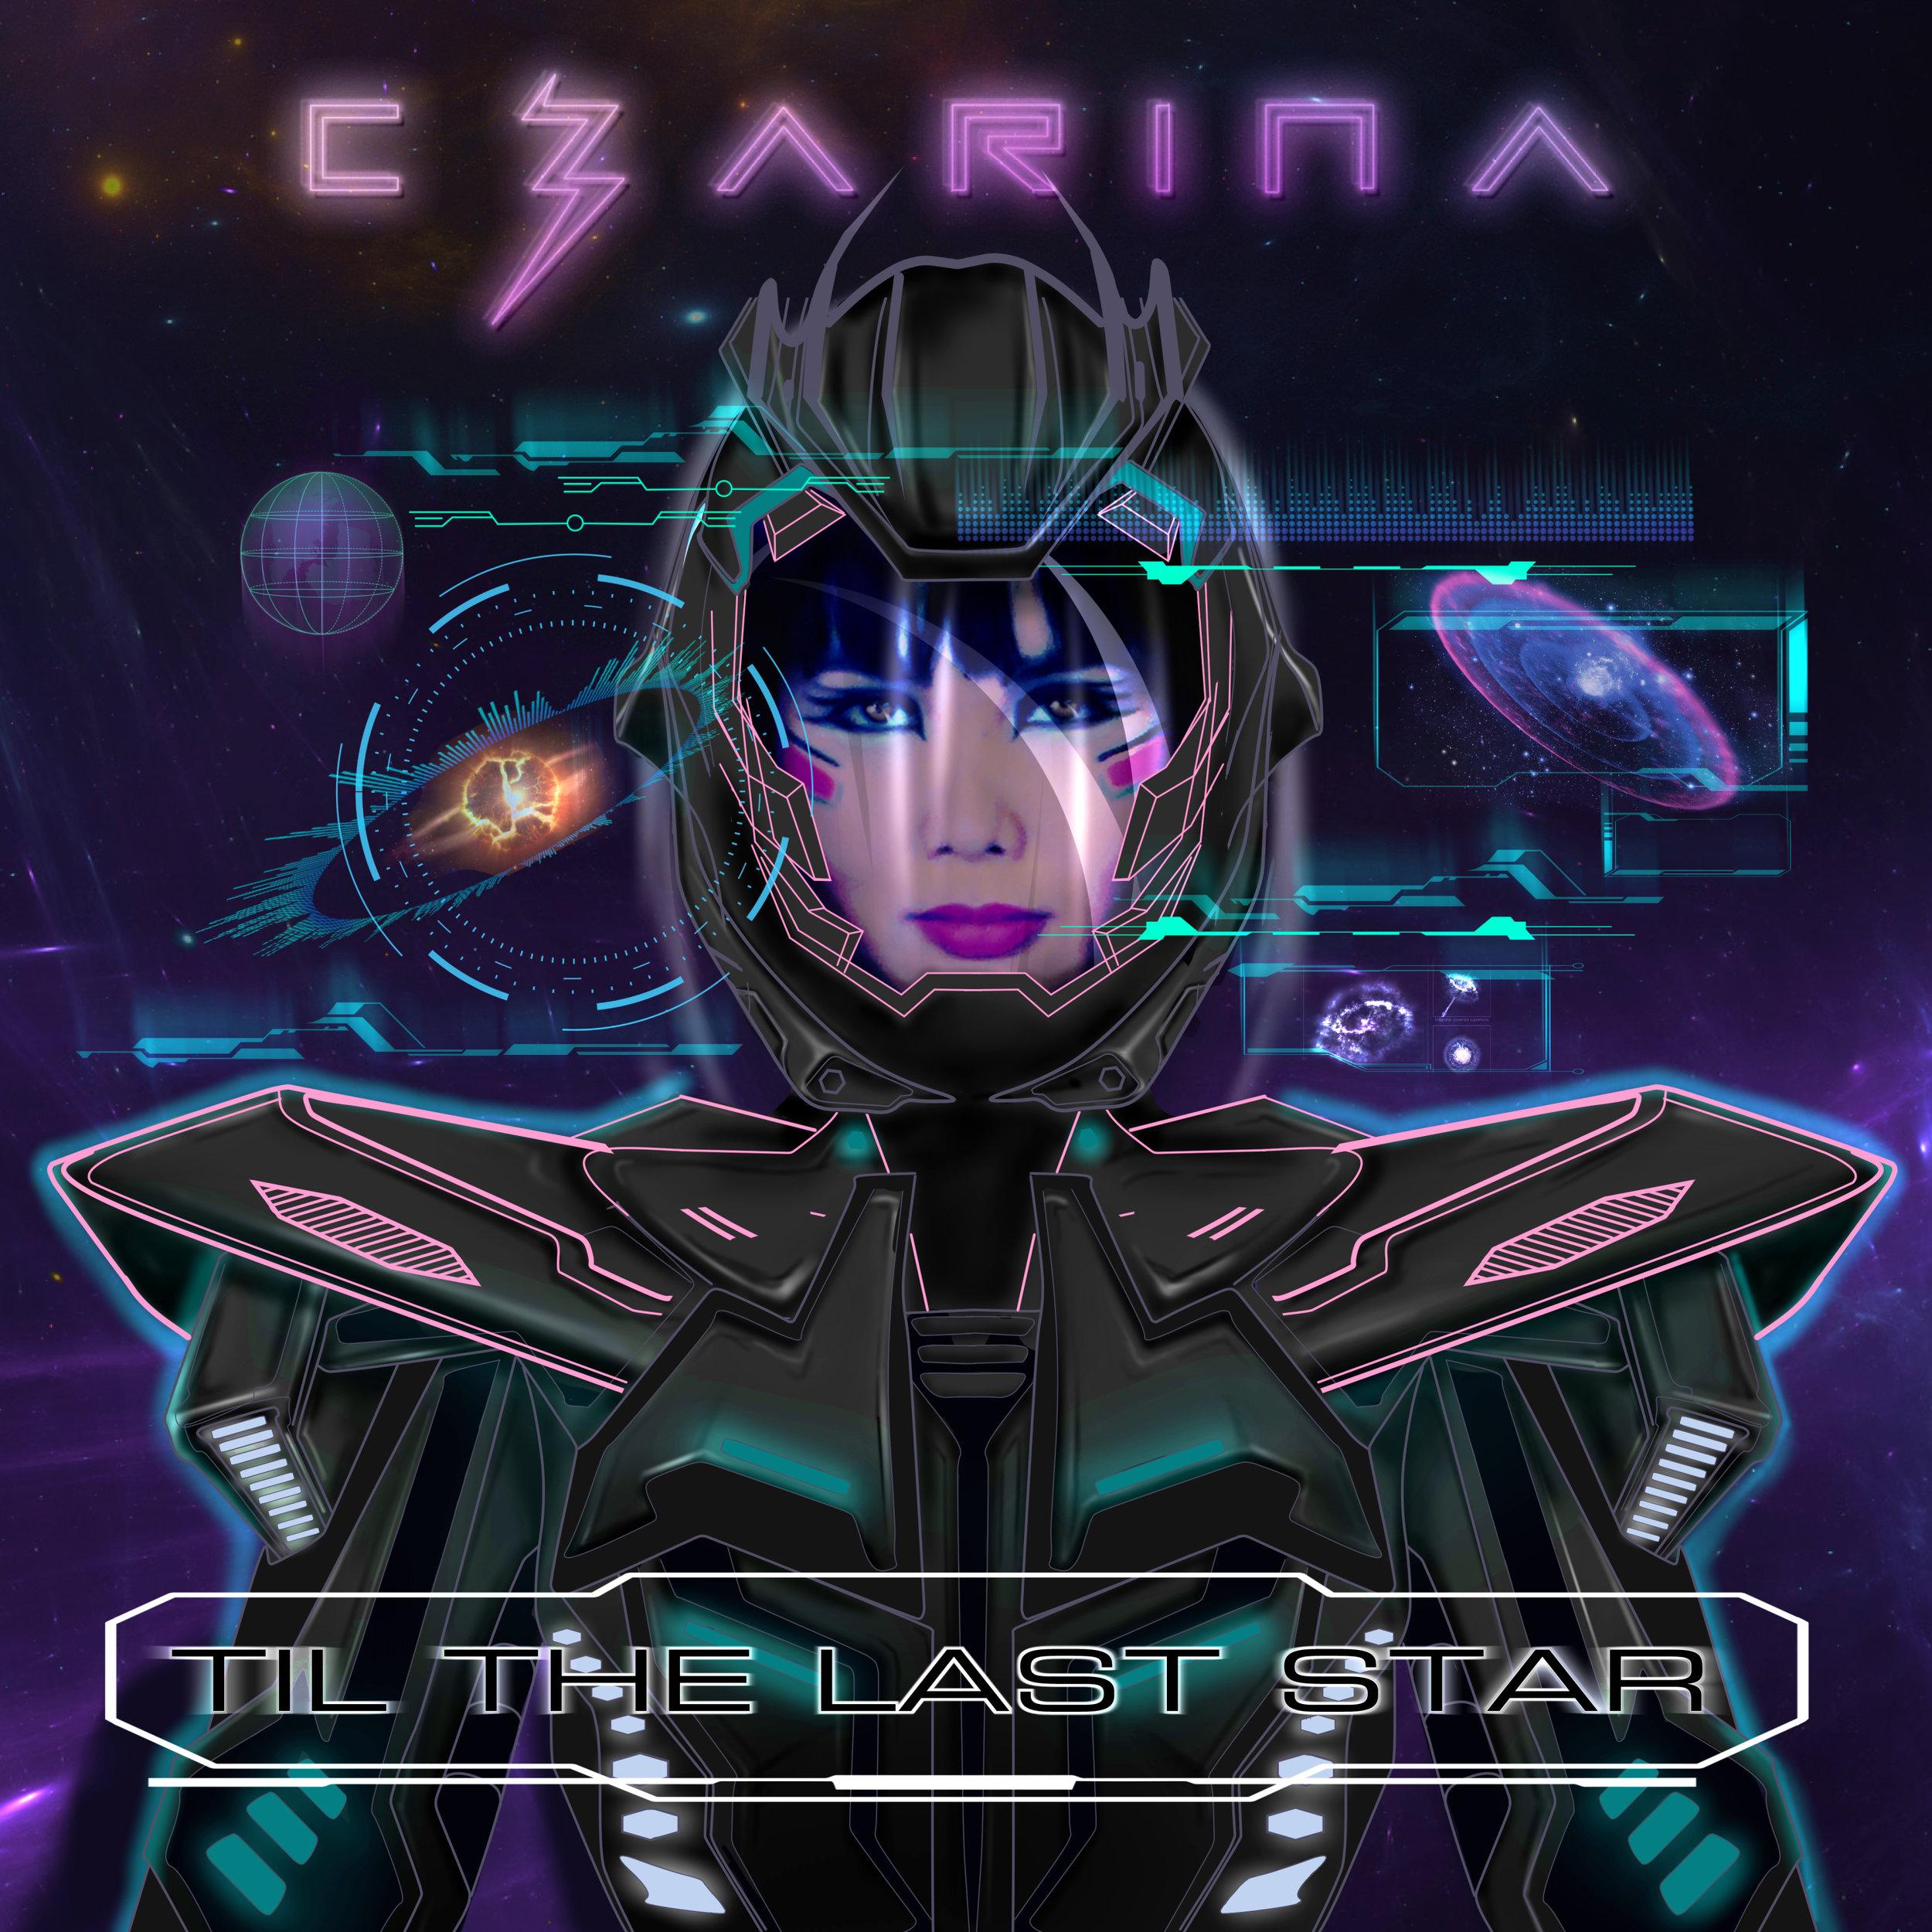 CZARINA-TilTheLastStar.jpg